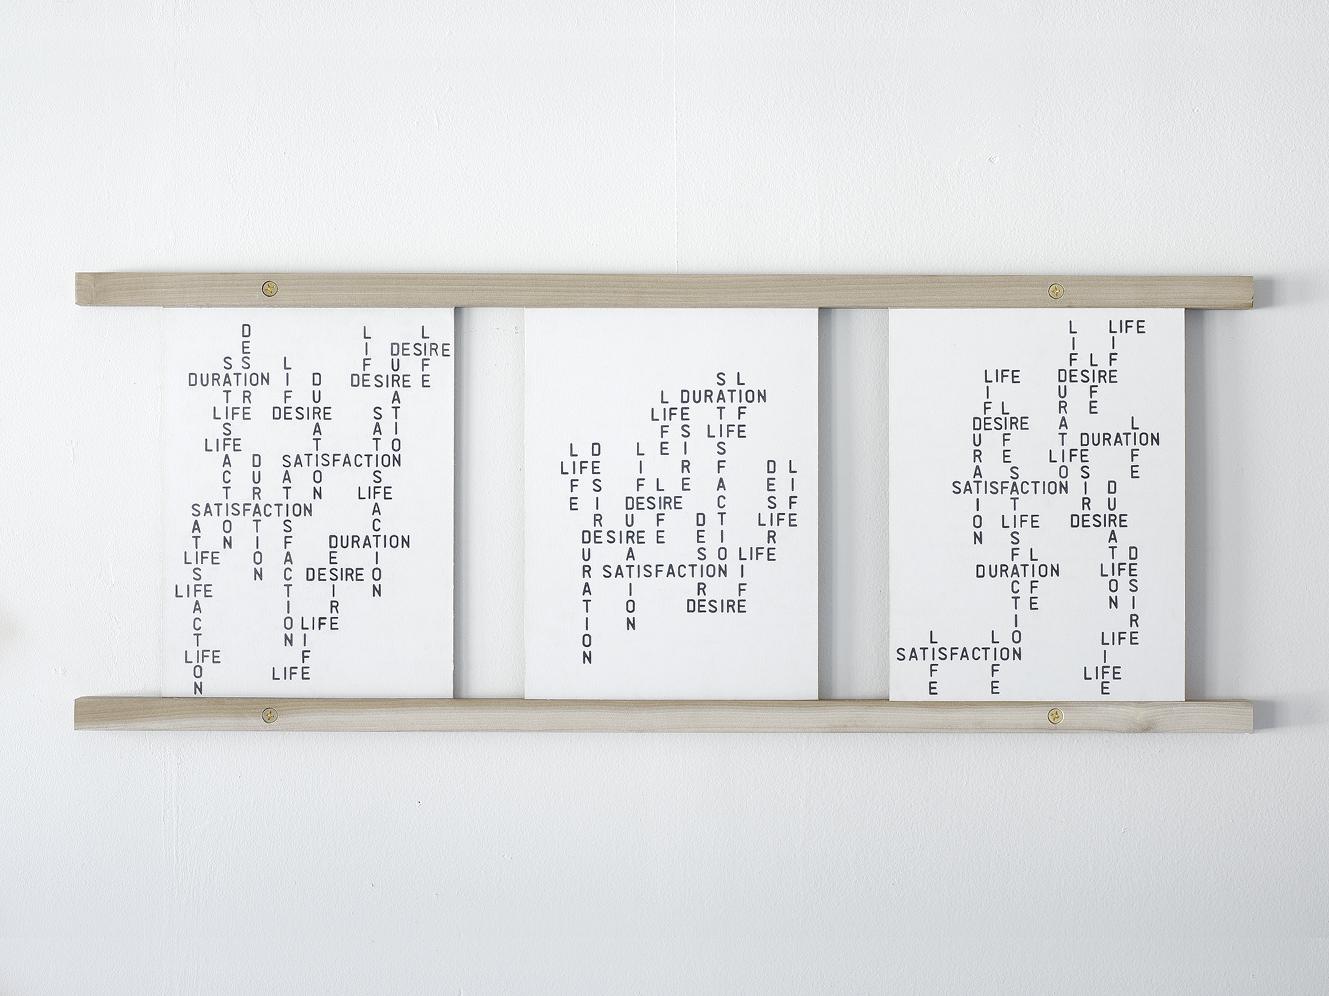 Benoit-Delaunay-artiste-installations-2013-A Set of Valuable Skills-Life-Desire-Satisfaction-Duration-10